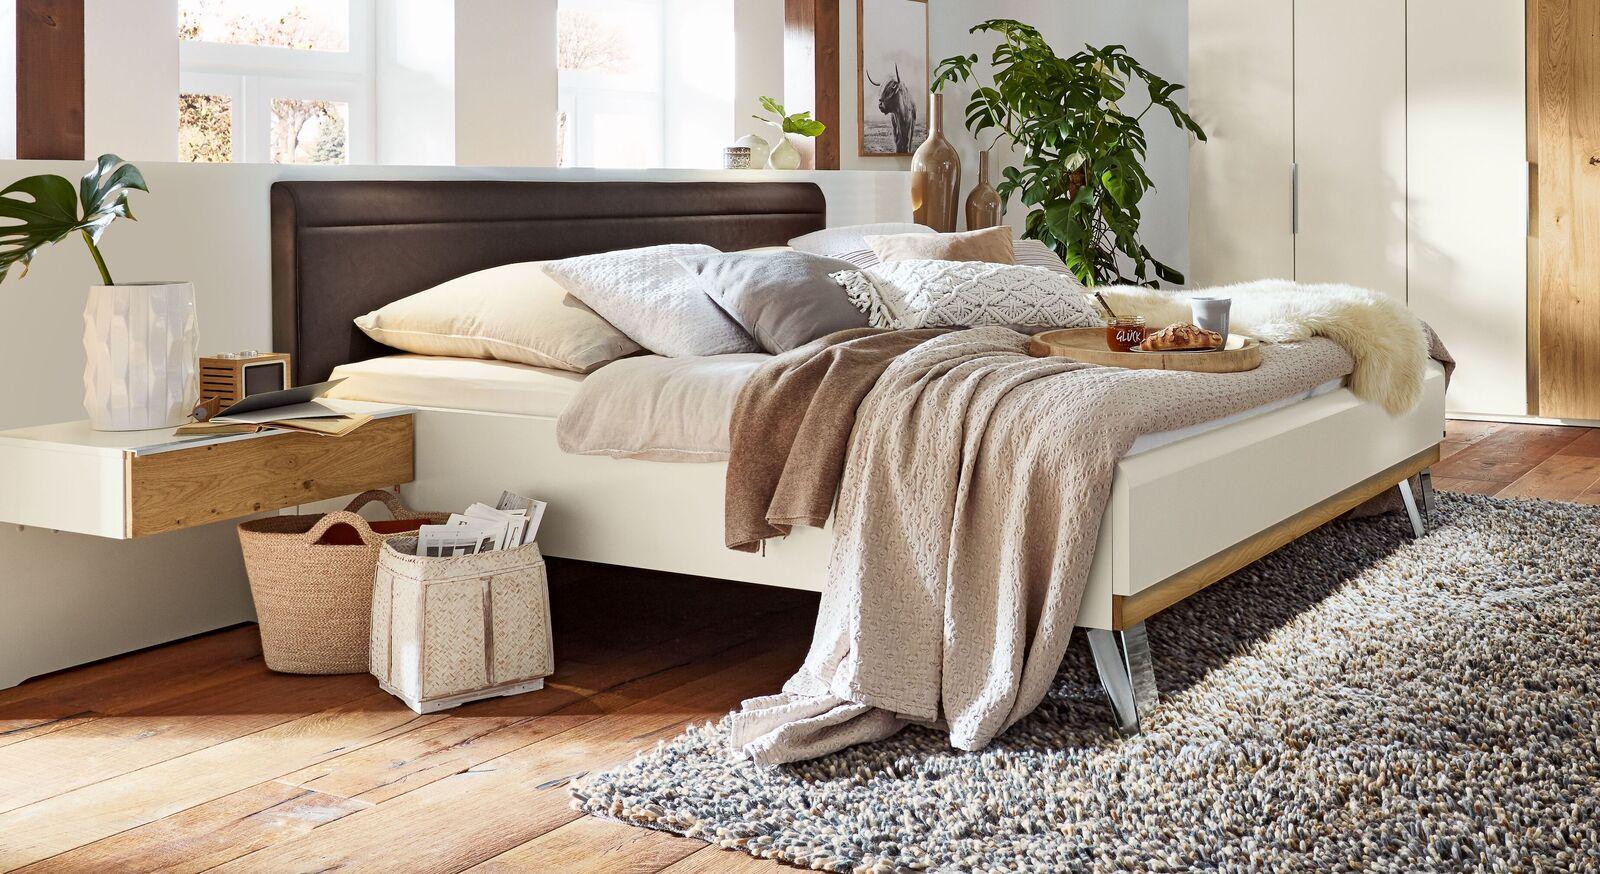 Musterring Bett Saphira weiß mit eleganten Holzelementen